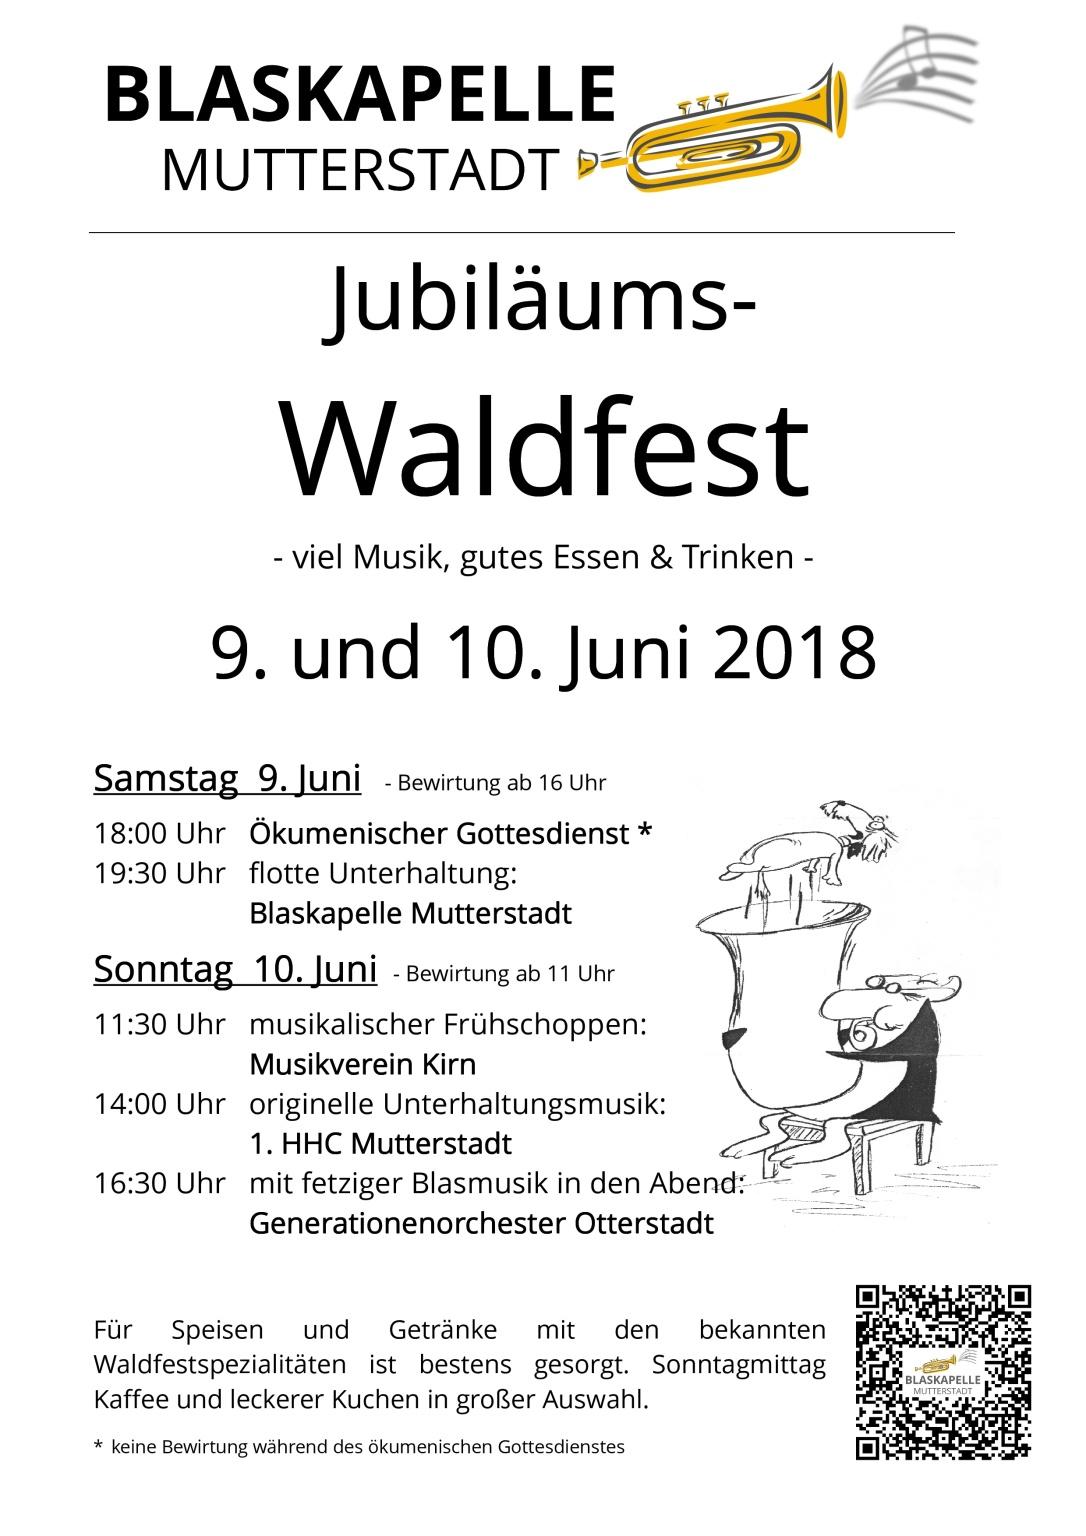 Waldfest-Plakat 2018